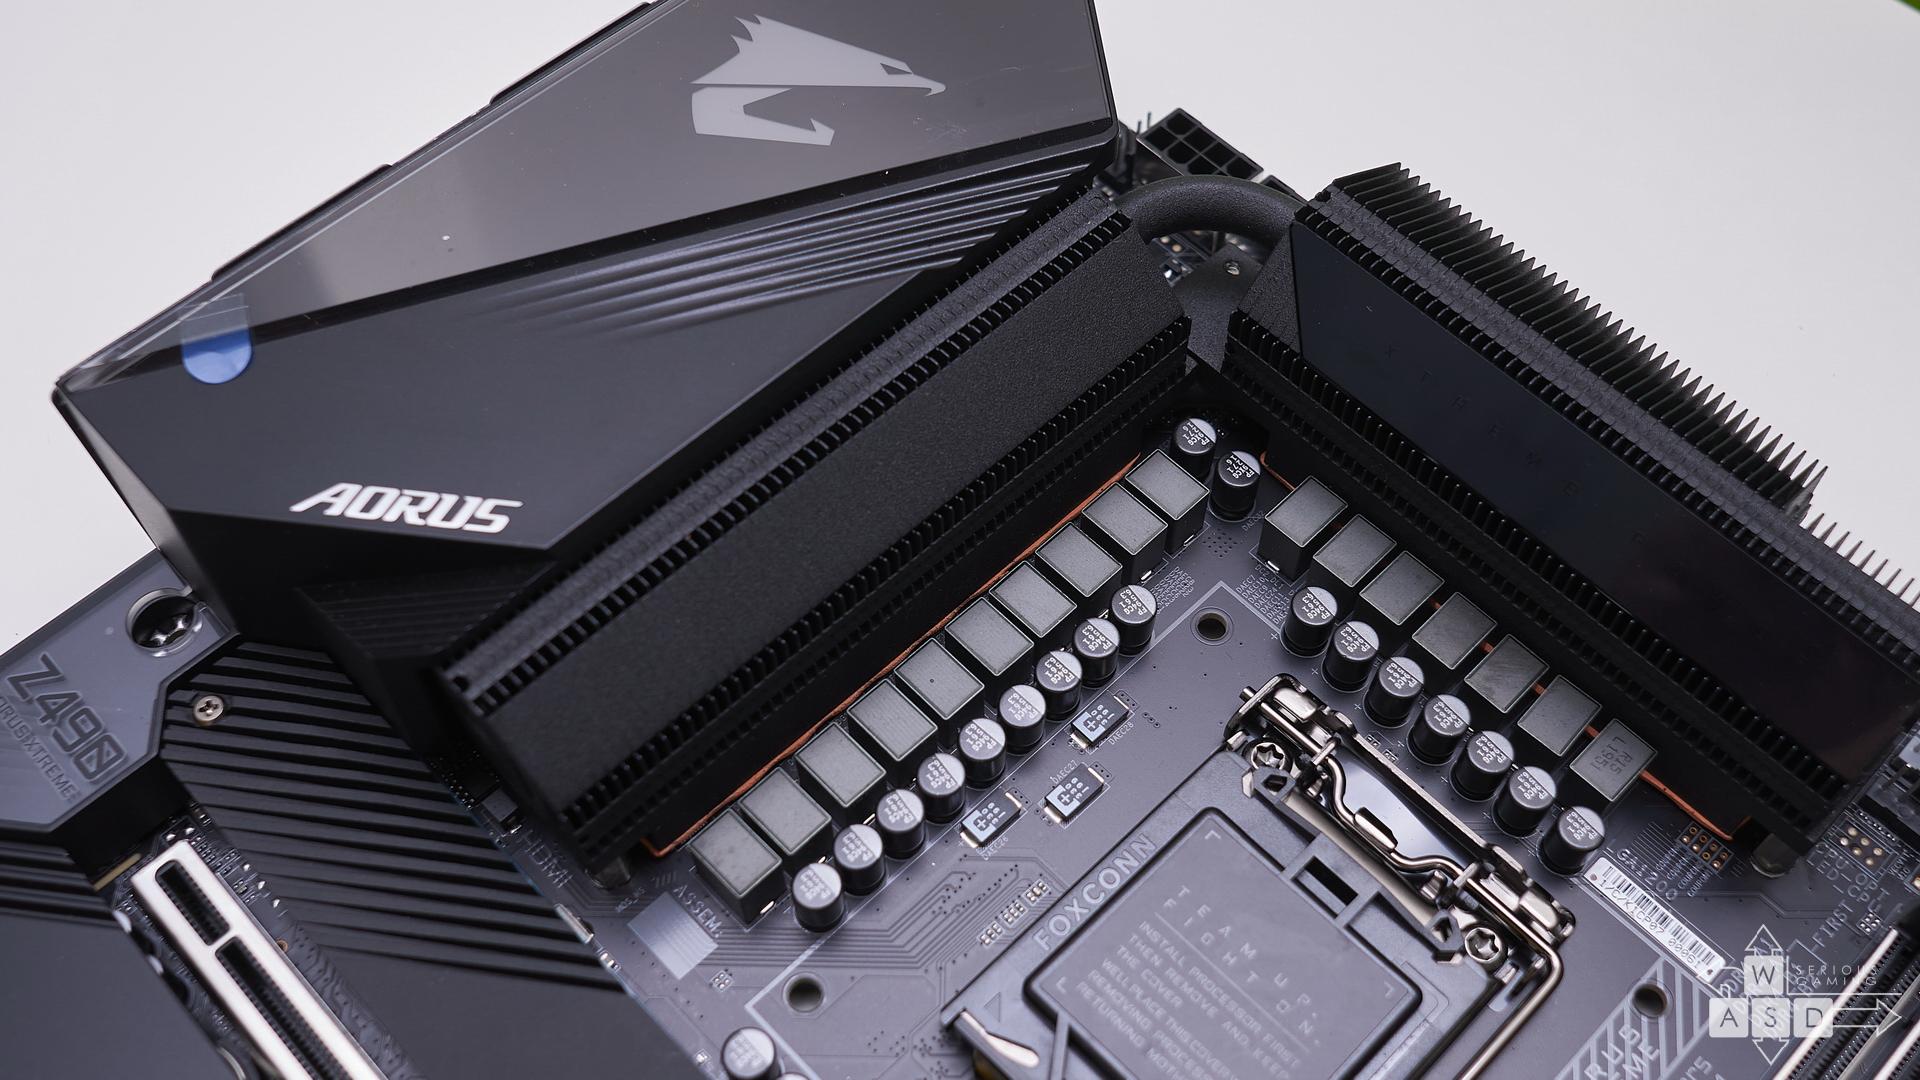 Gigabyte Z490 Aorus Extreme review | WASD